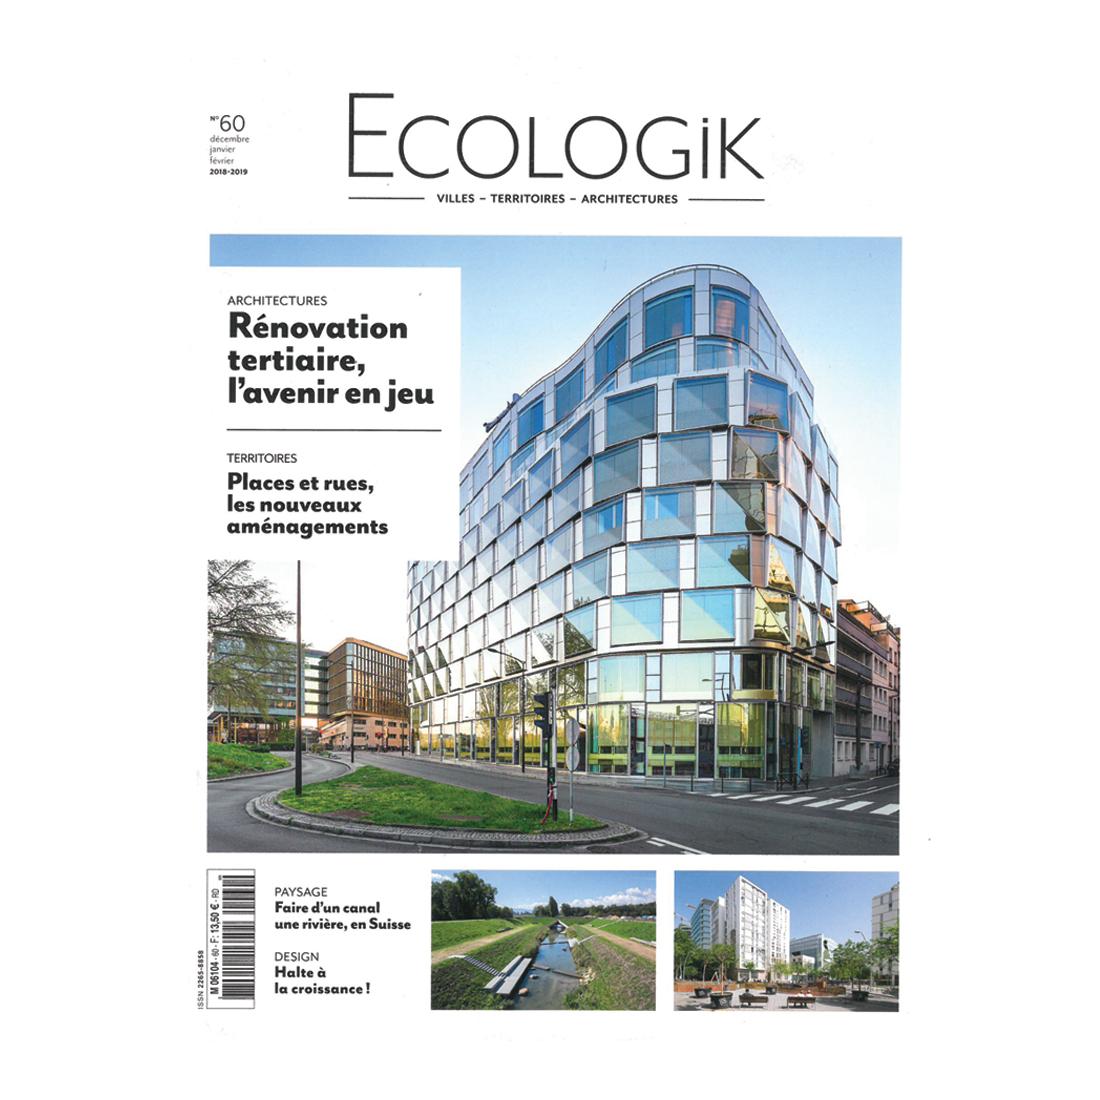 ECOLOGIK N°60 | Brenac & Gonzalez et Associés